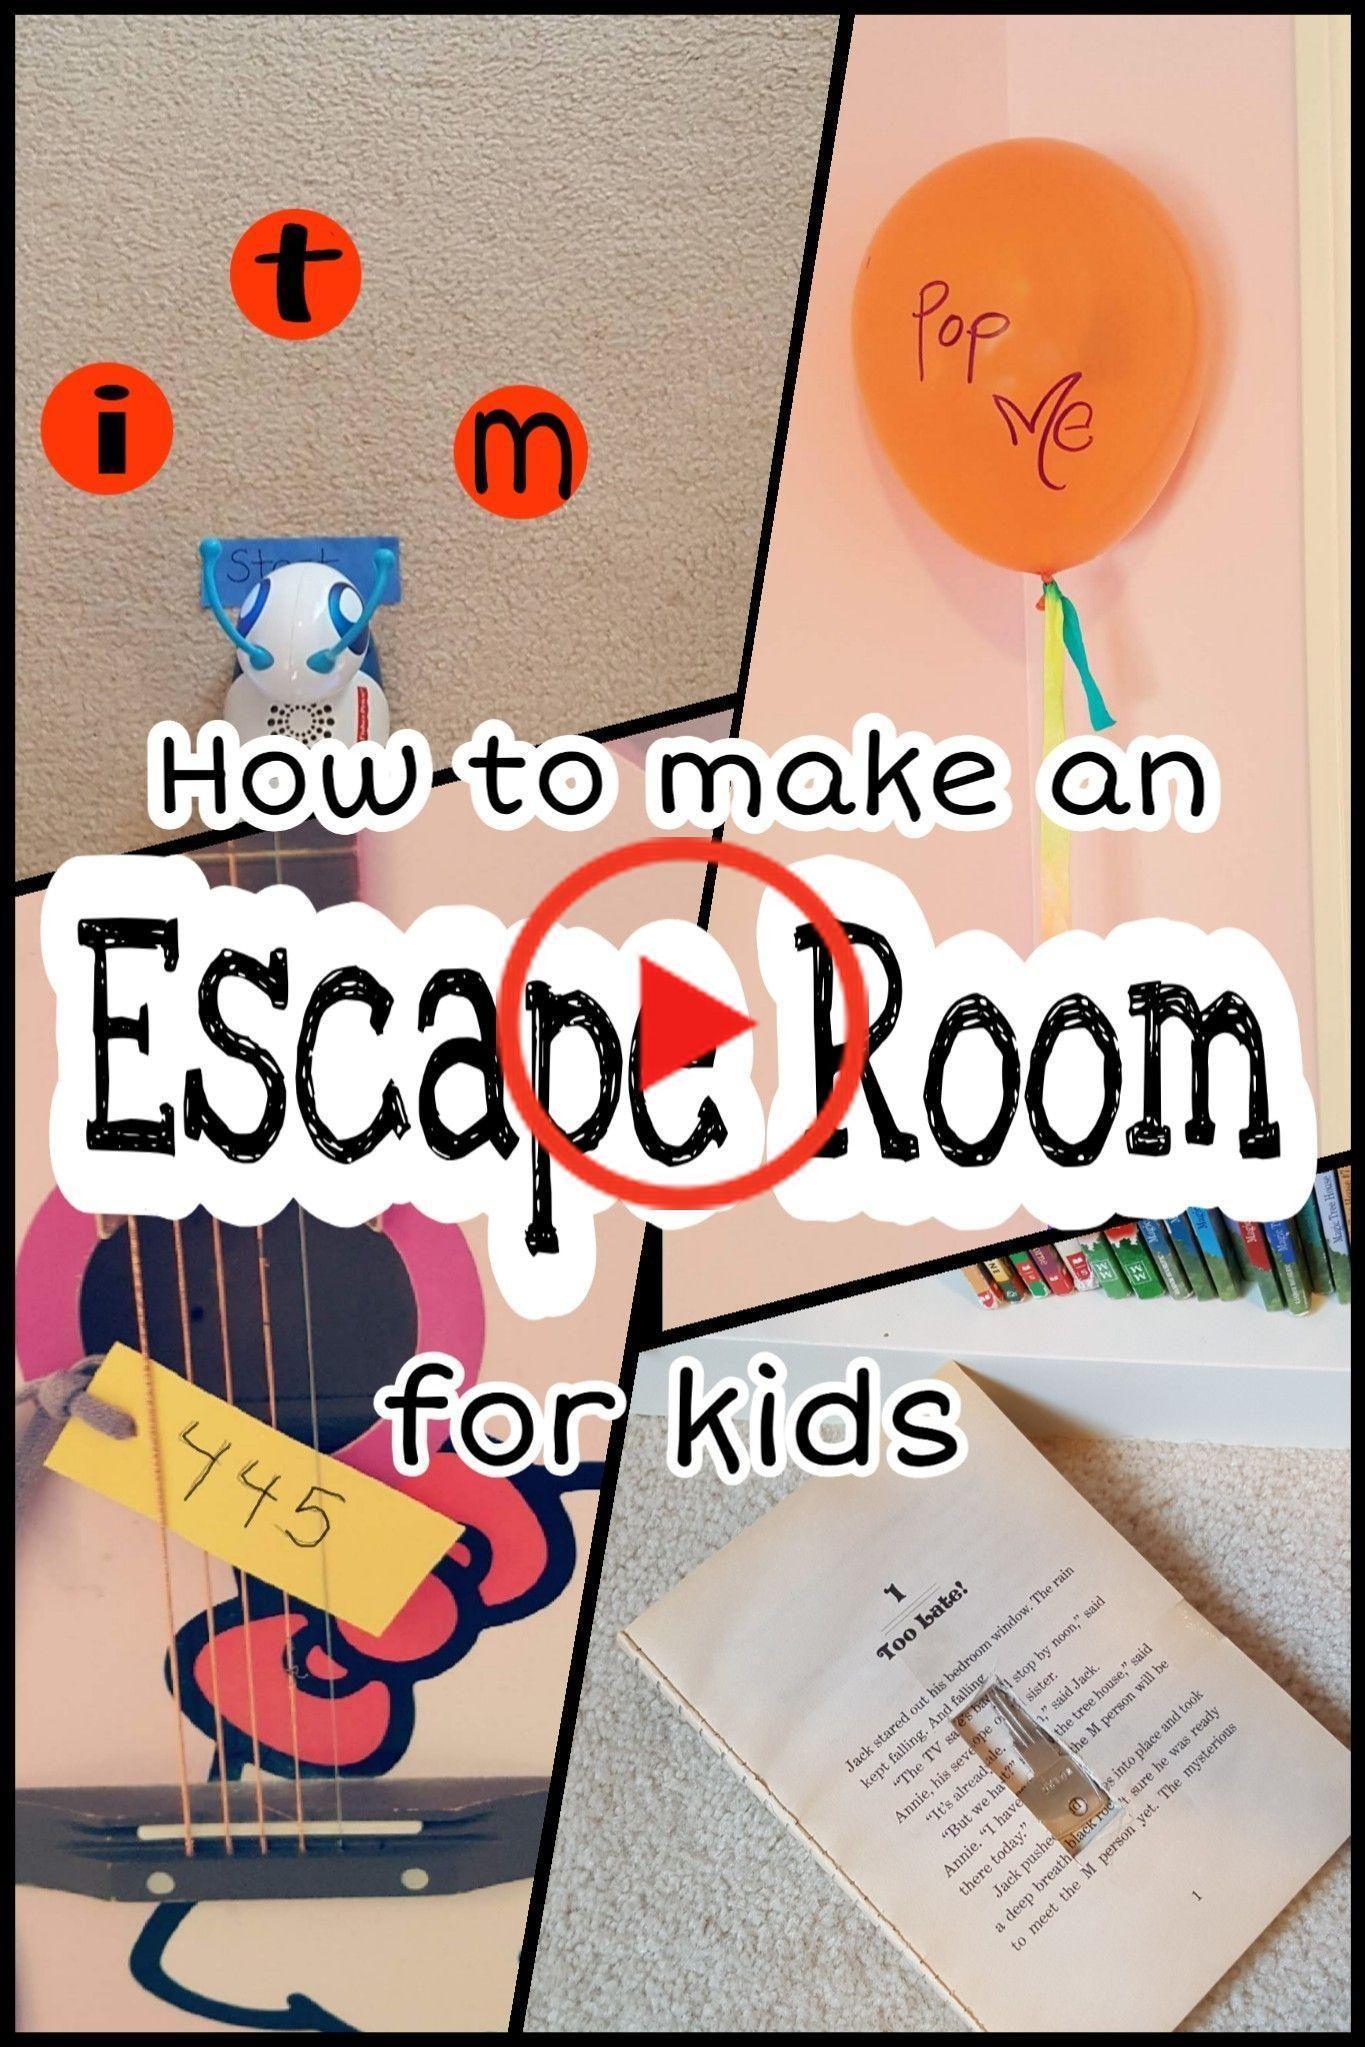 Escape room for kids in 2020 kinderfeest activiteiten